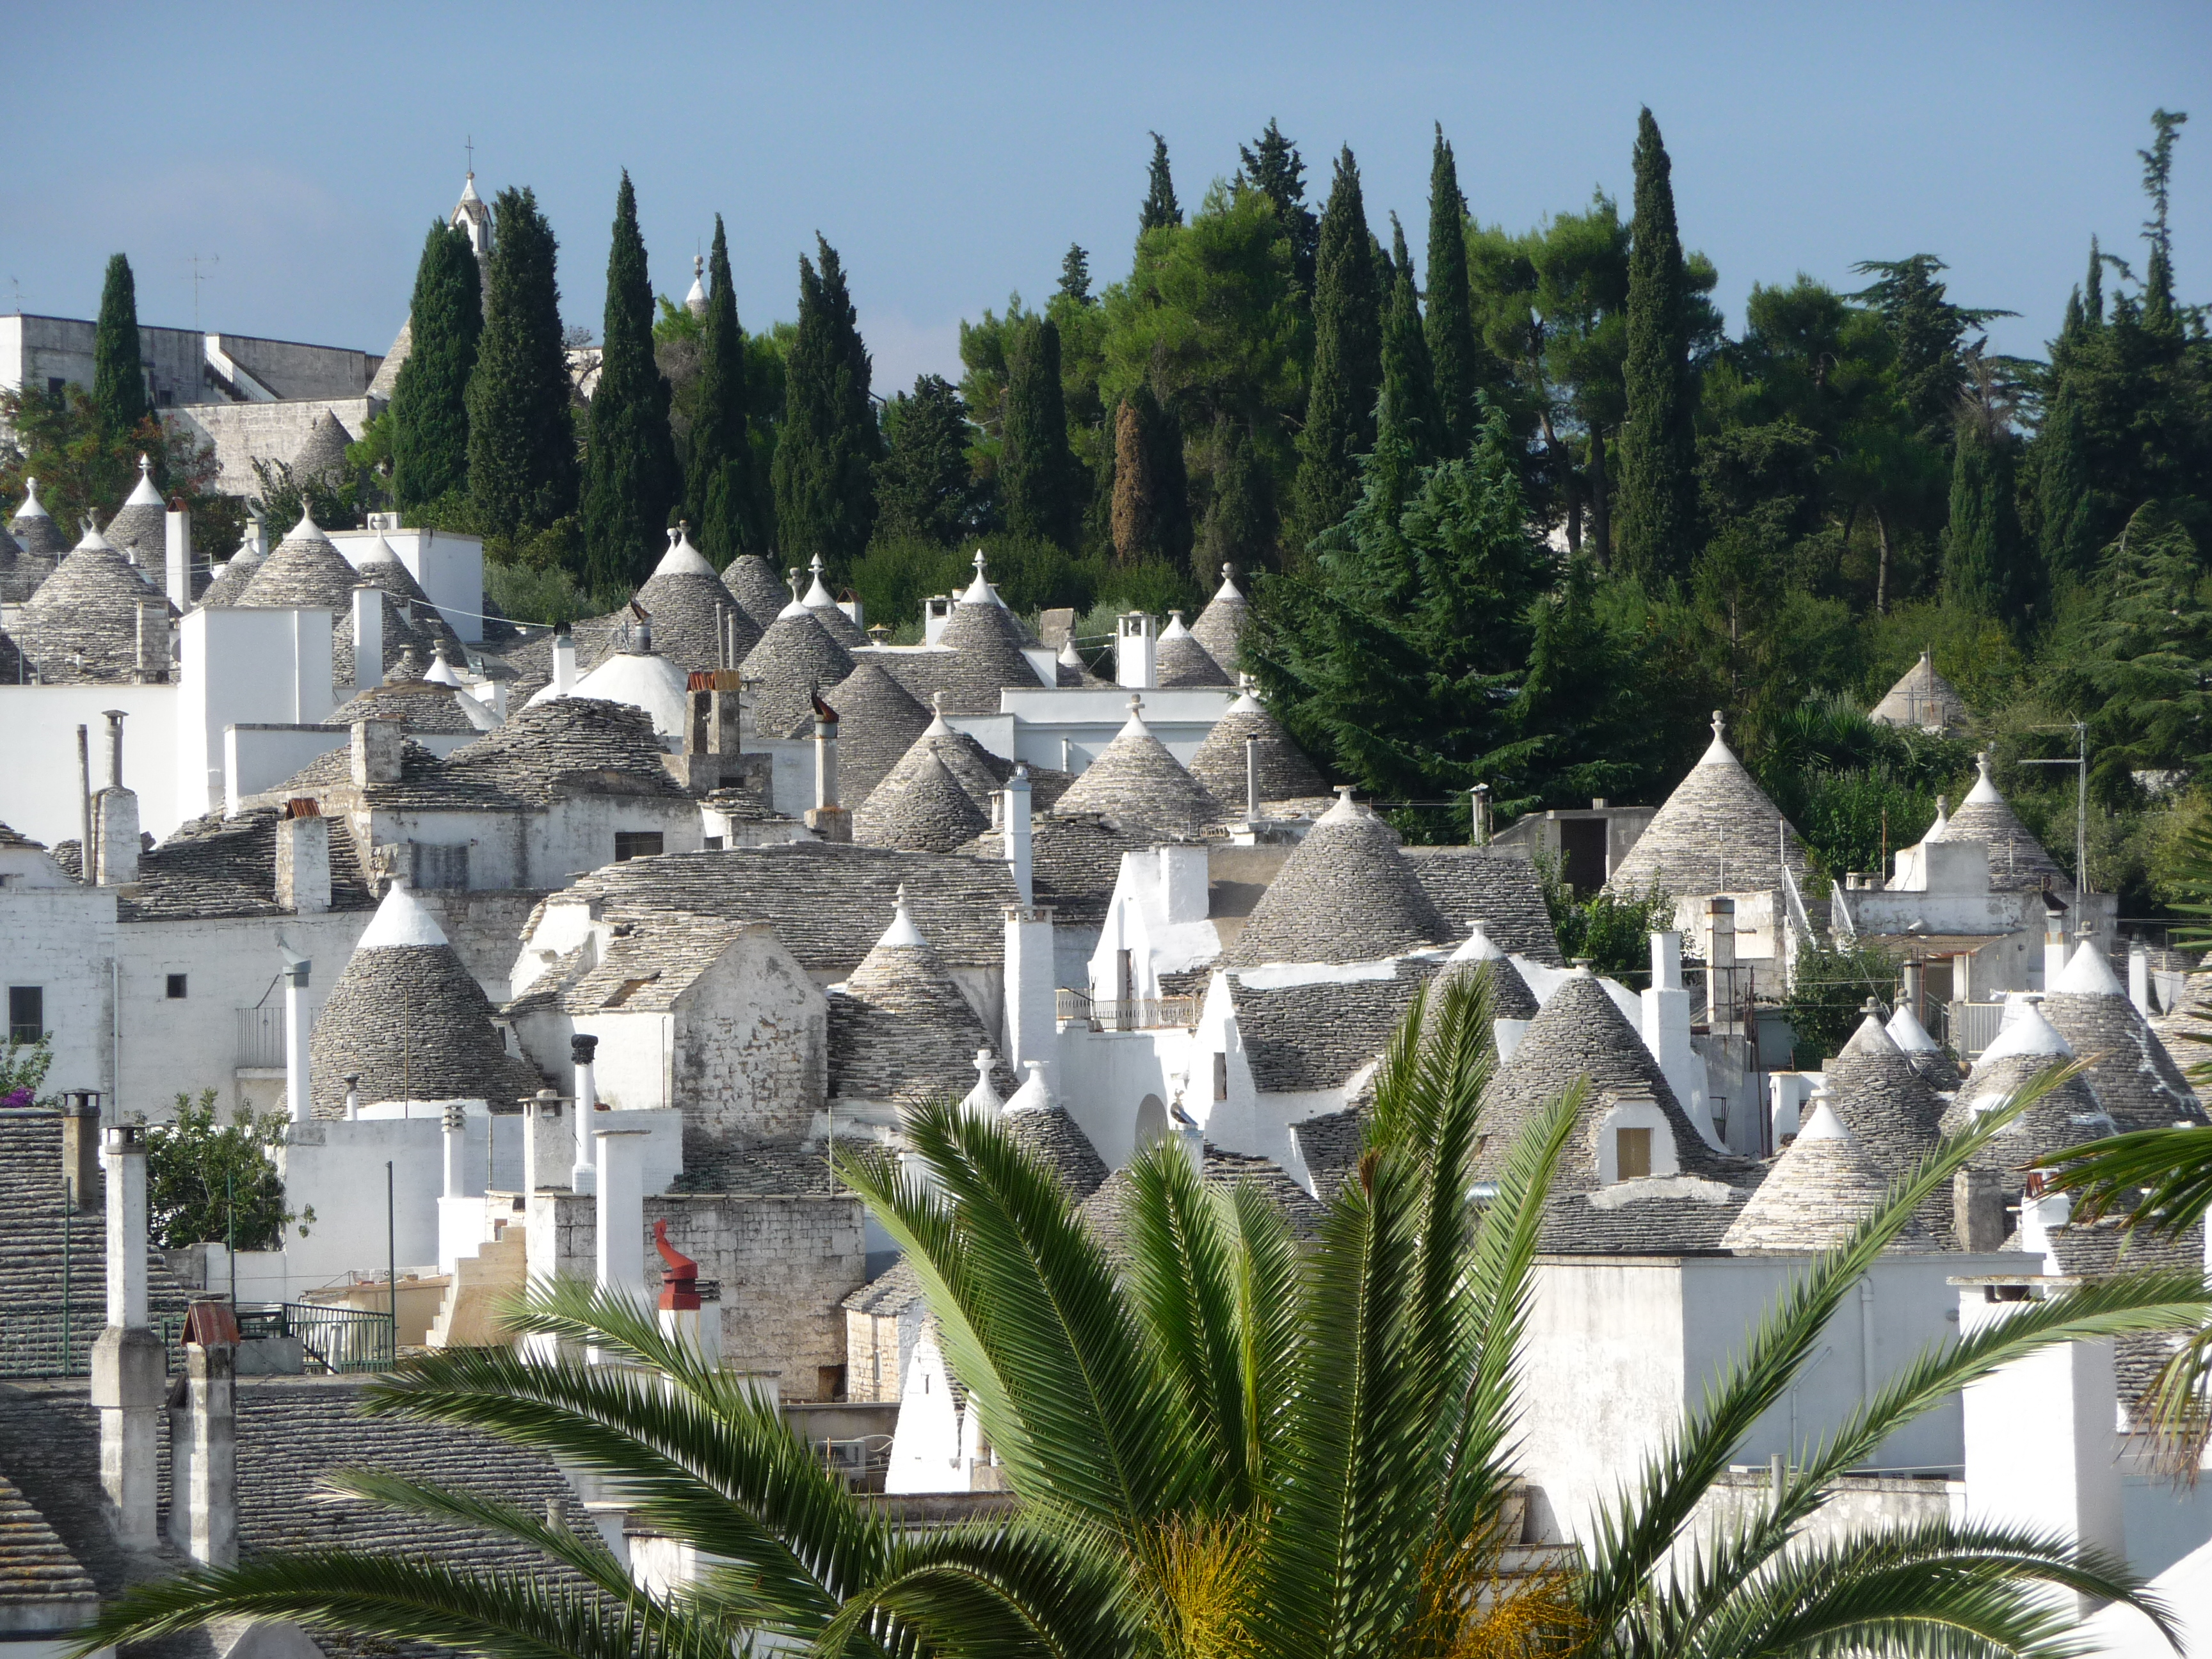 Cinque motivi per visitare la Puglia in estate fb3089070c57